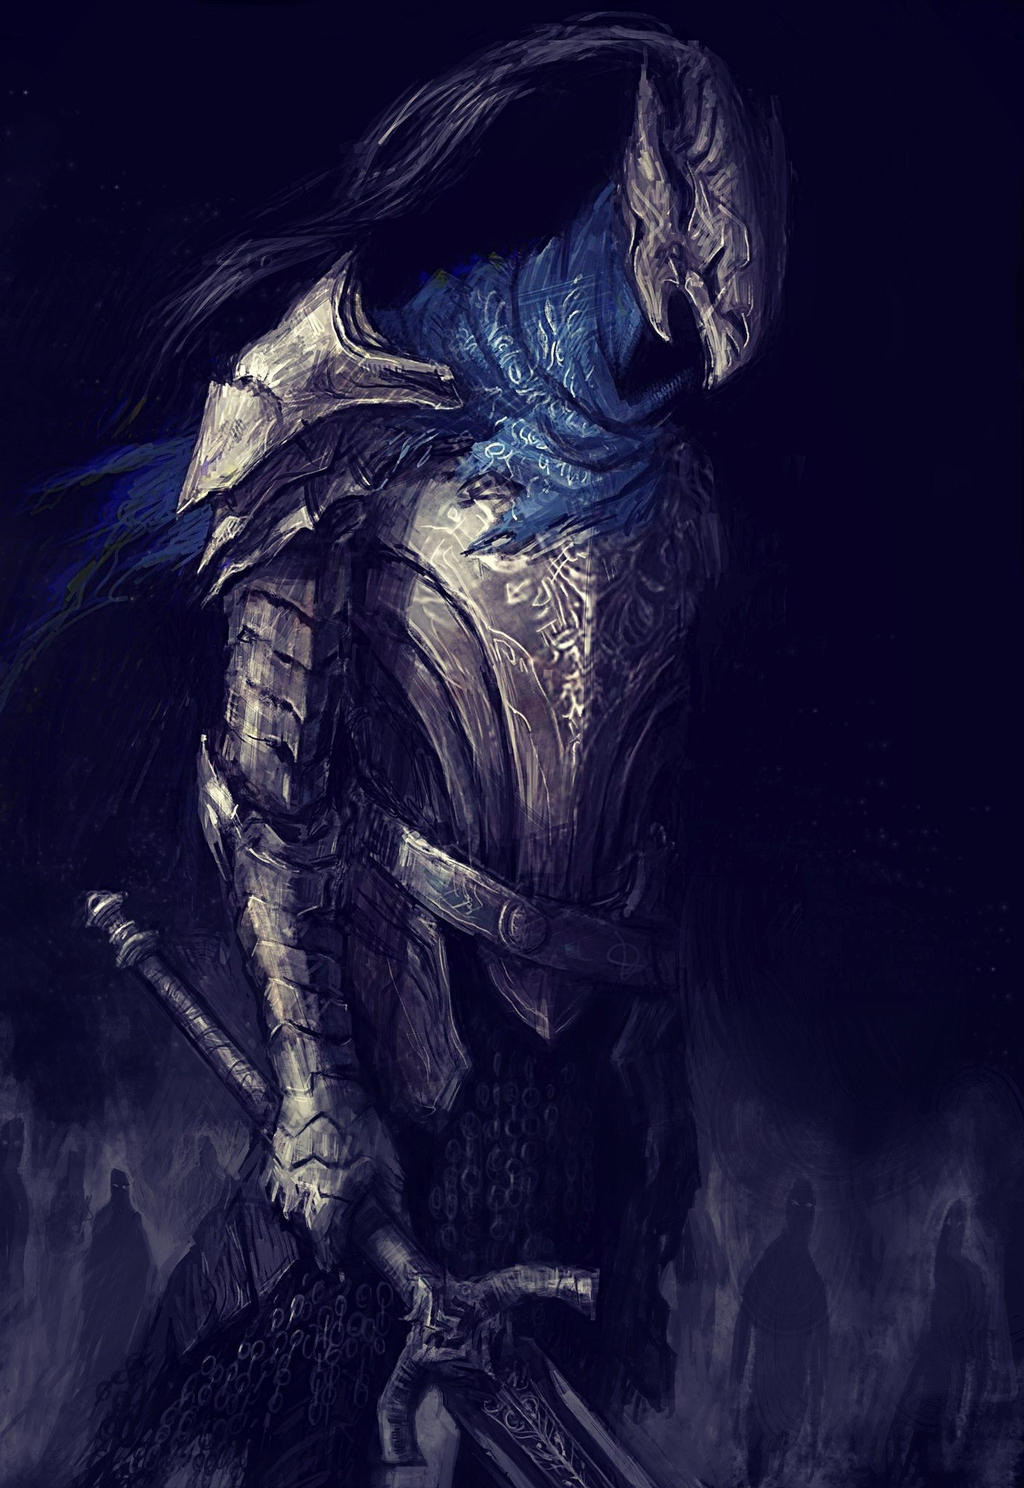 Ficha de Overzurg Vorgtoe Artorias_the_abysswalker_by_vulpes_ibculta-d8lqyhn